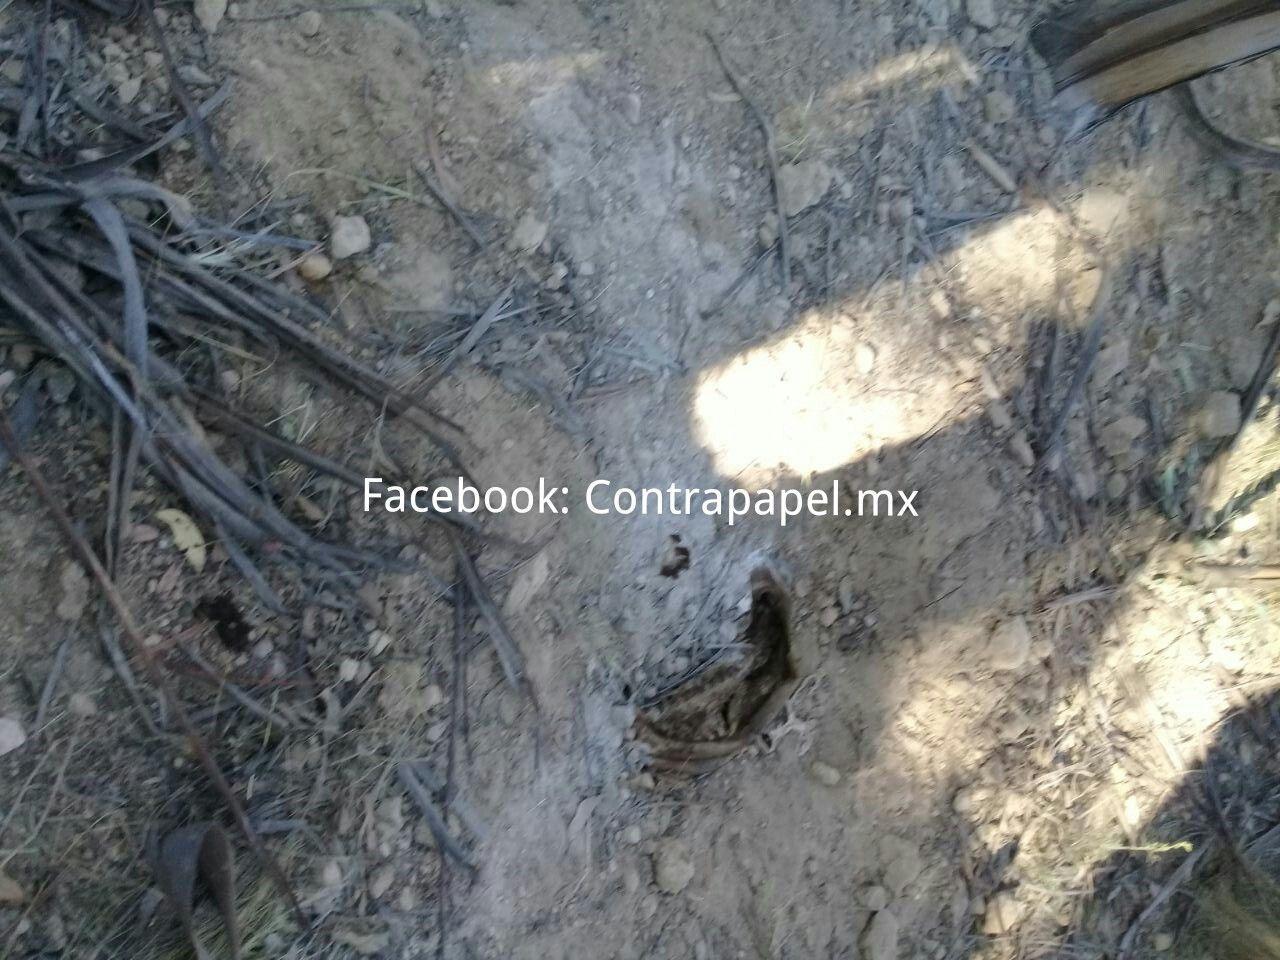 Identifican cadáveres hallados en fosa clandestina de Tepetlaoxtoc; FGJEM atrae investigación